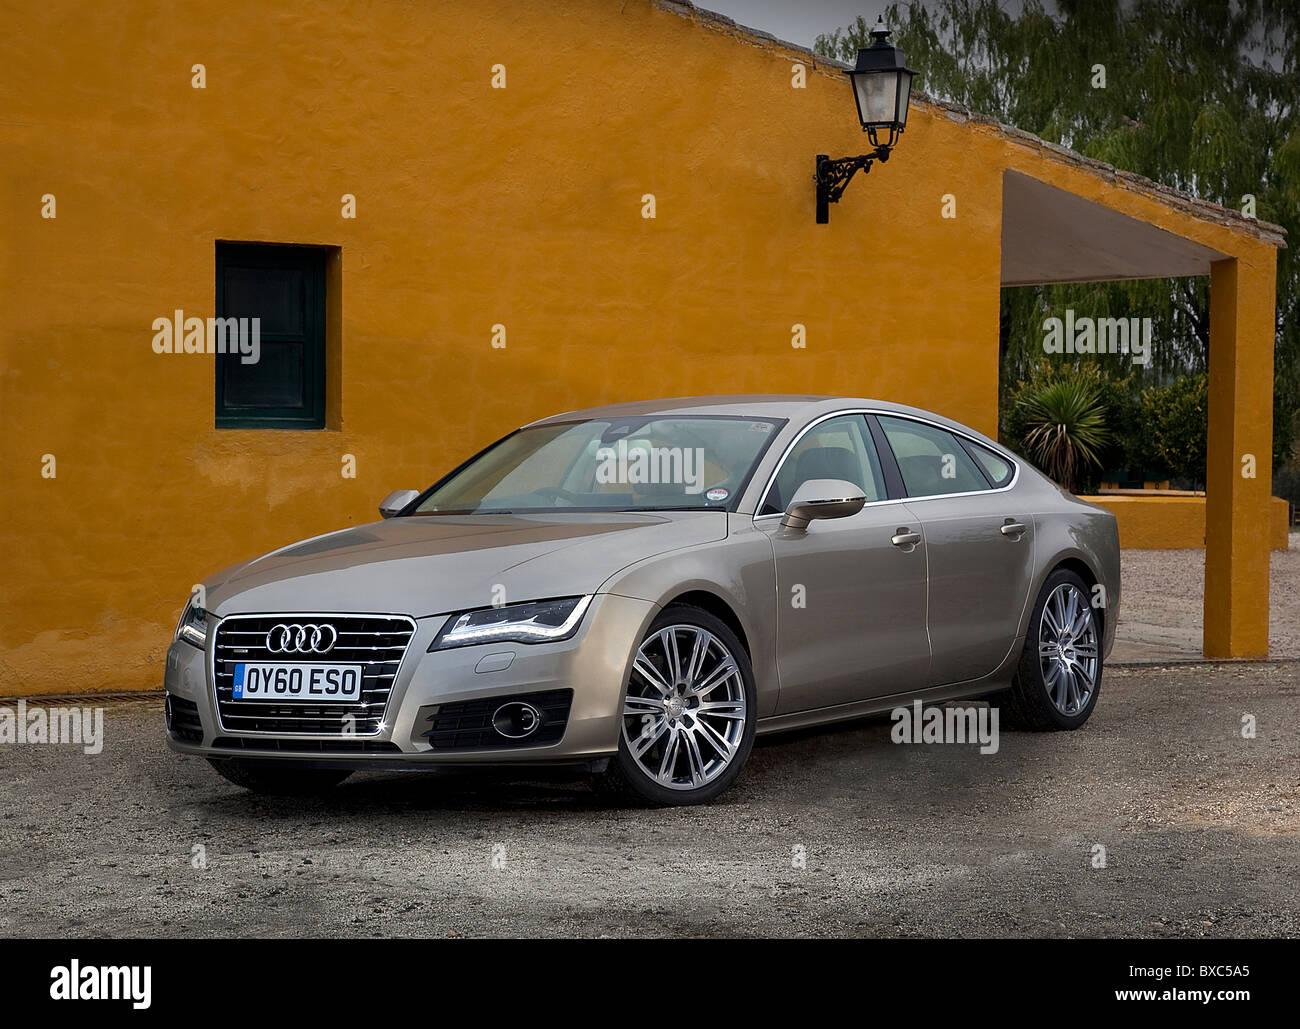 Audi A7 Sportback - Stock Image